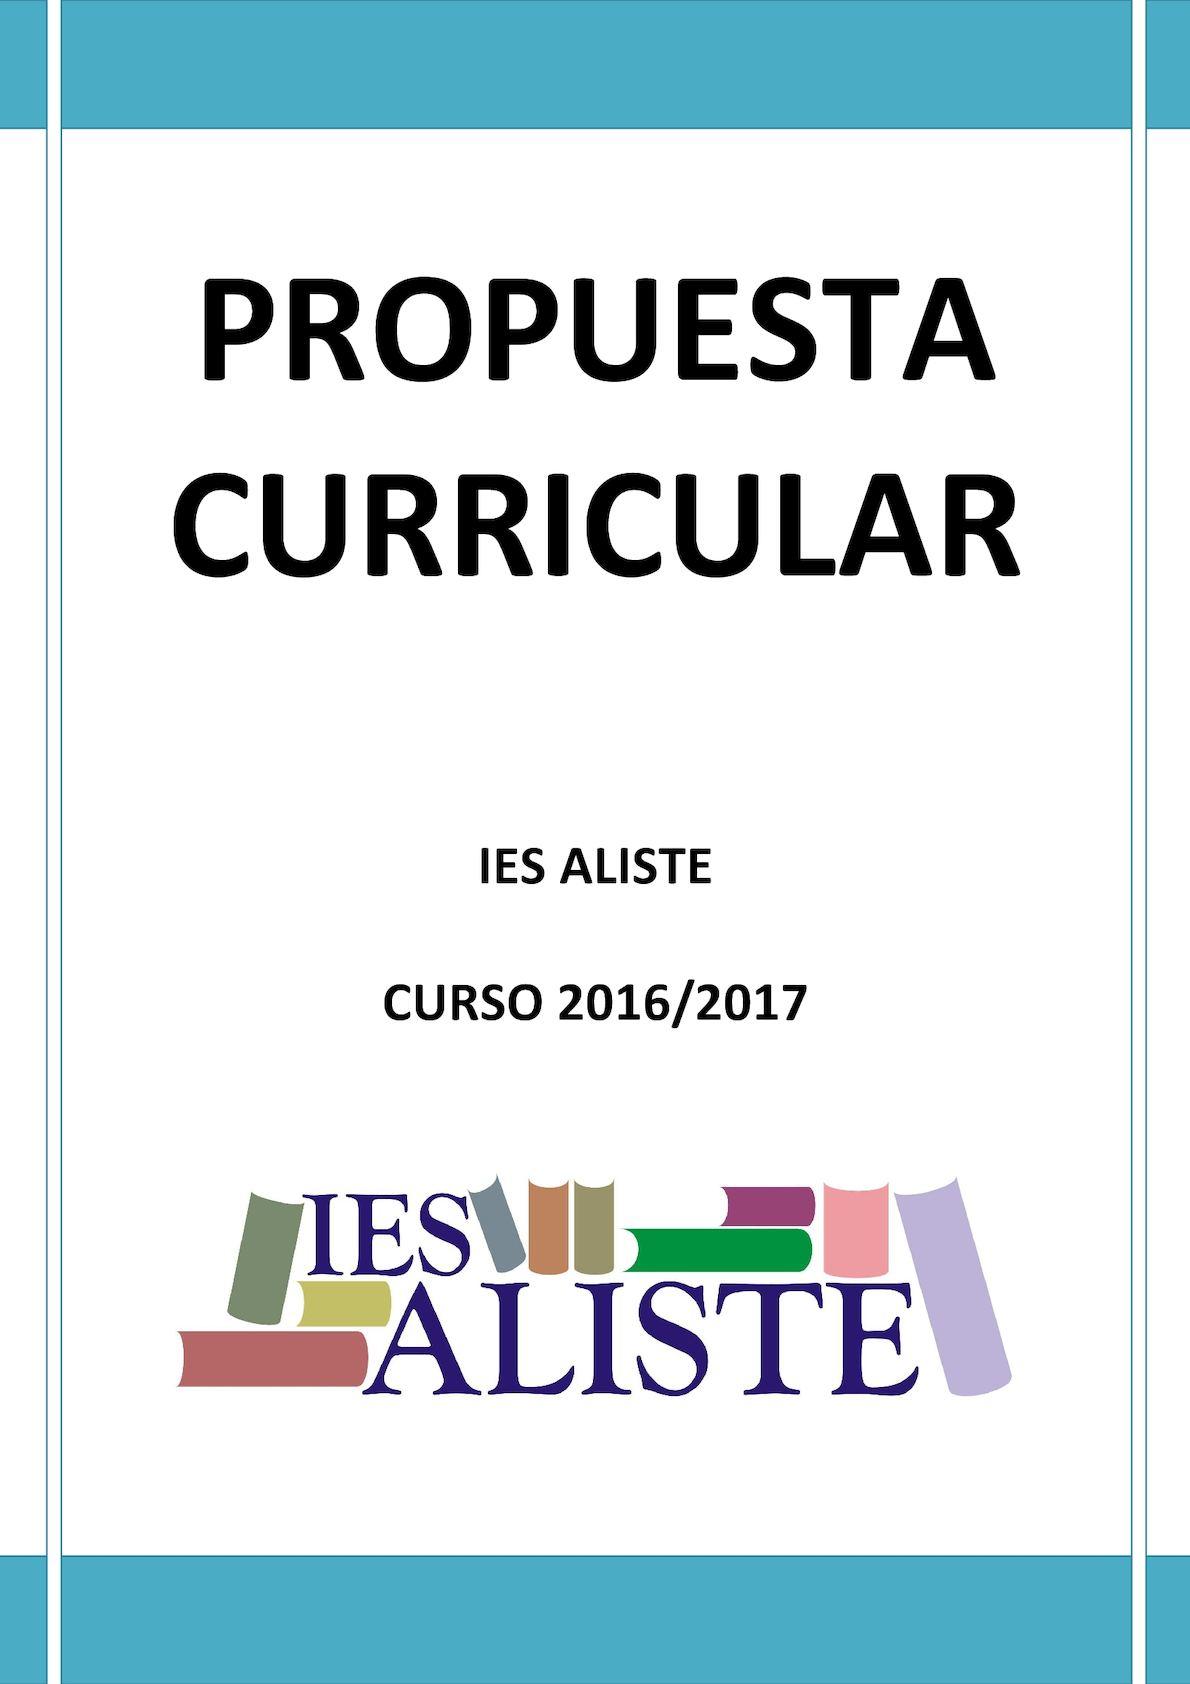 Calaméo - Propuesta Curricular 2016 2017